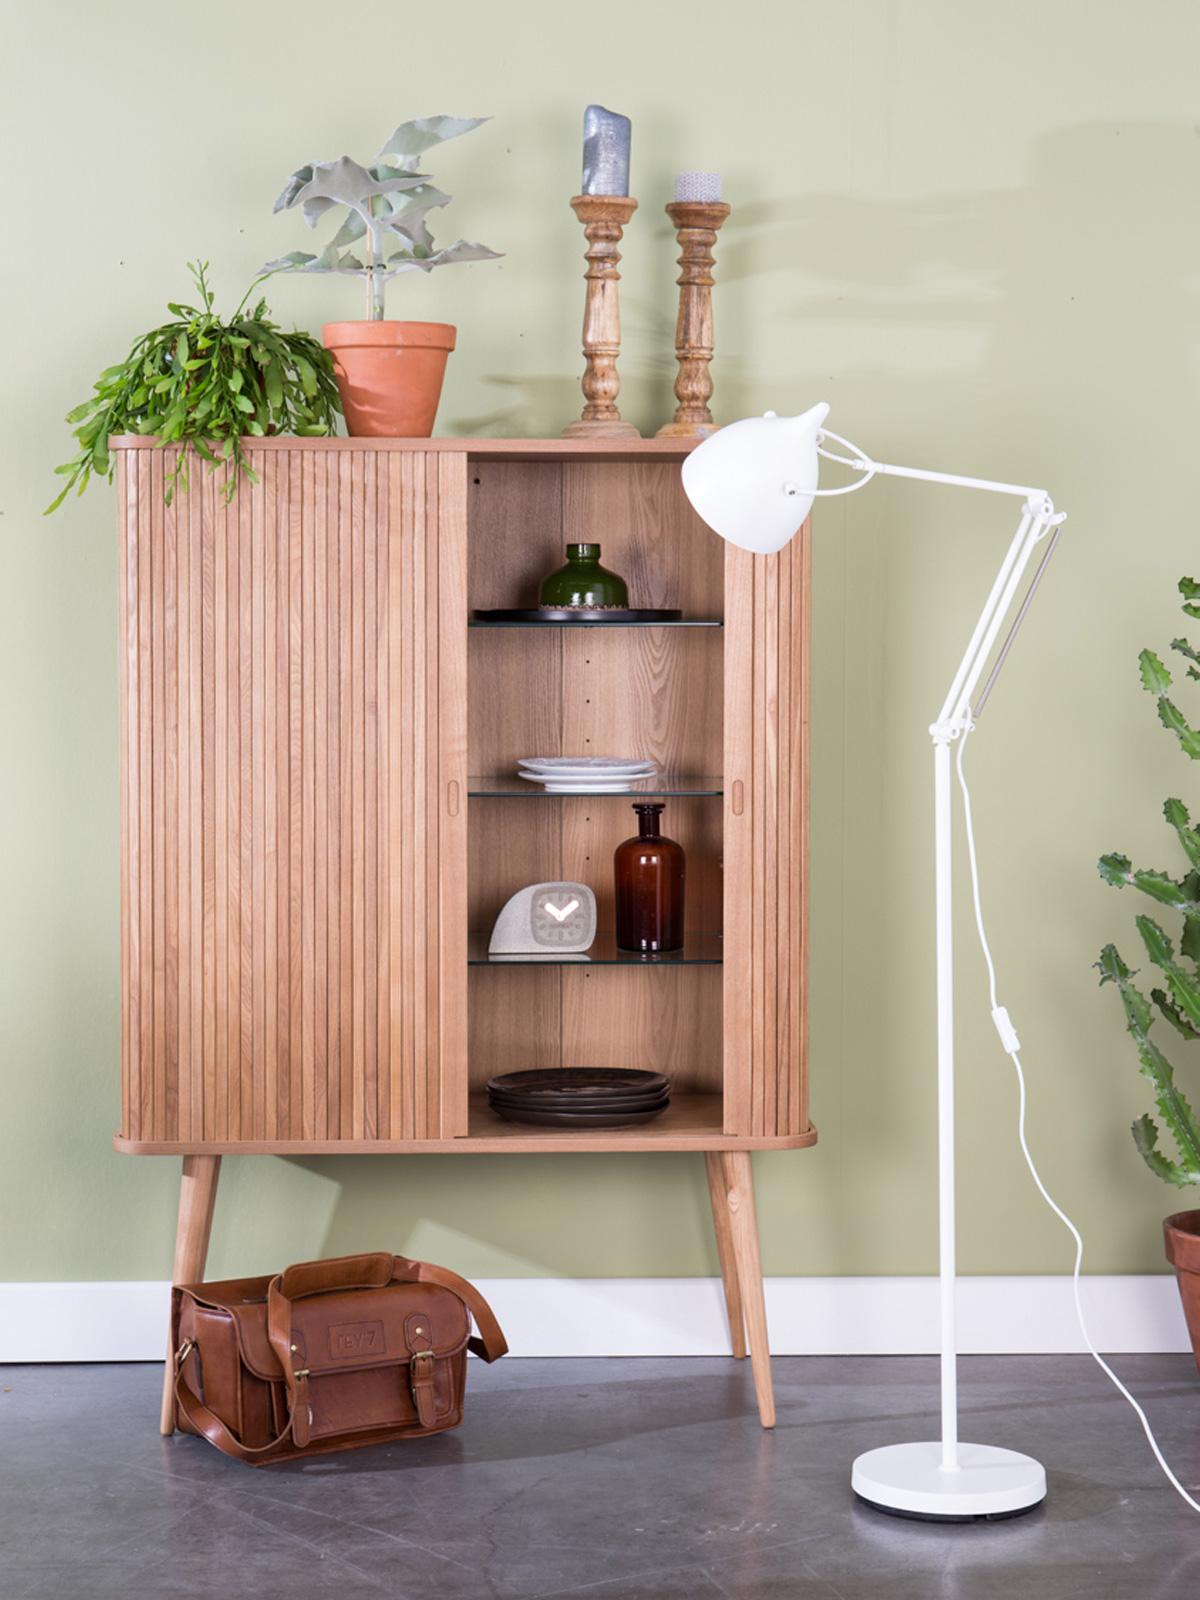 reader floor lampen leuchten online shop designort licht. Black Bedroom Furniture Sets. Home Design Ideas